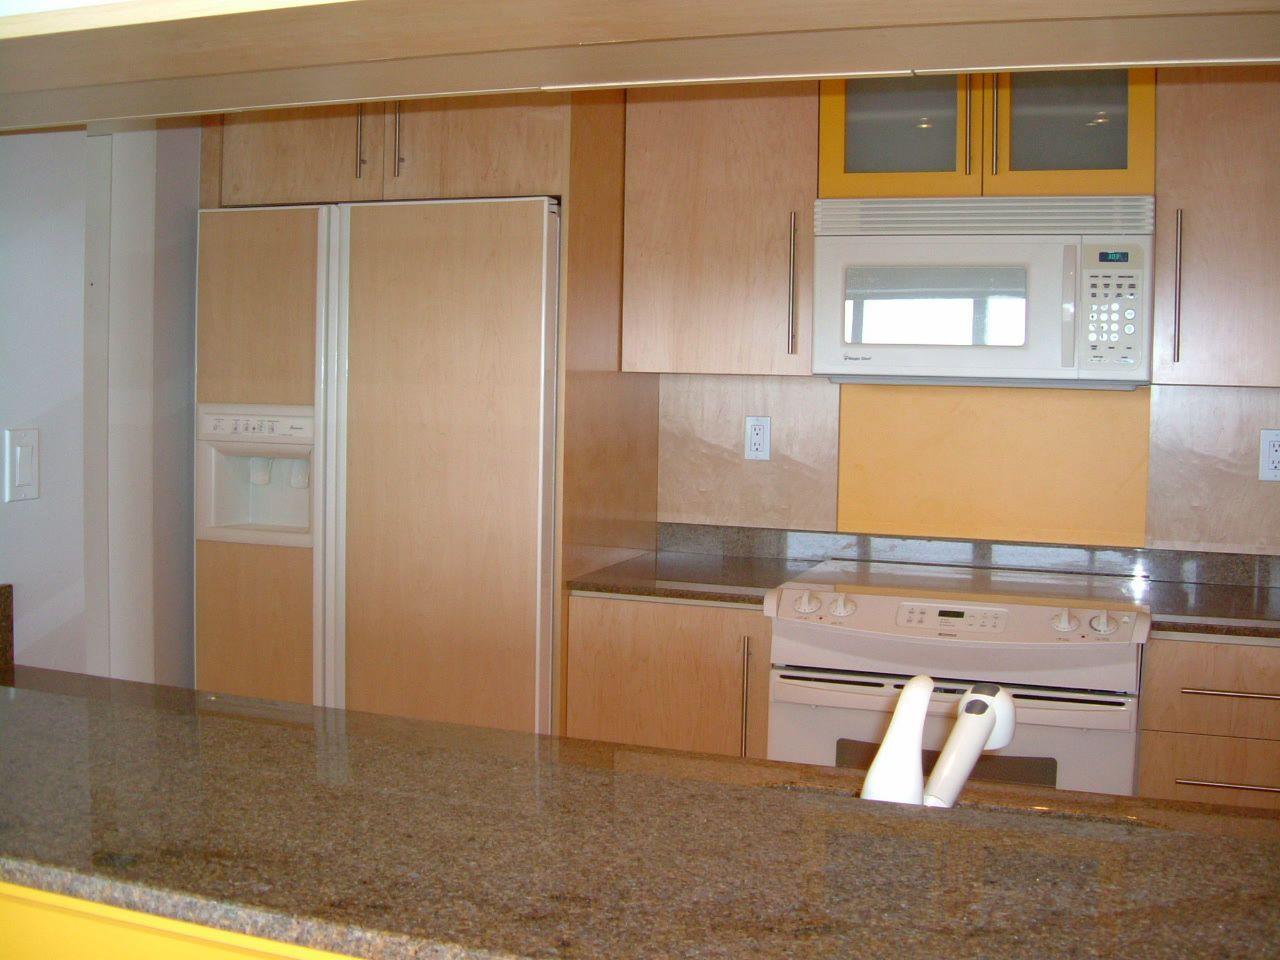 Kitchens-178.jpg